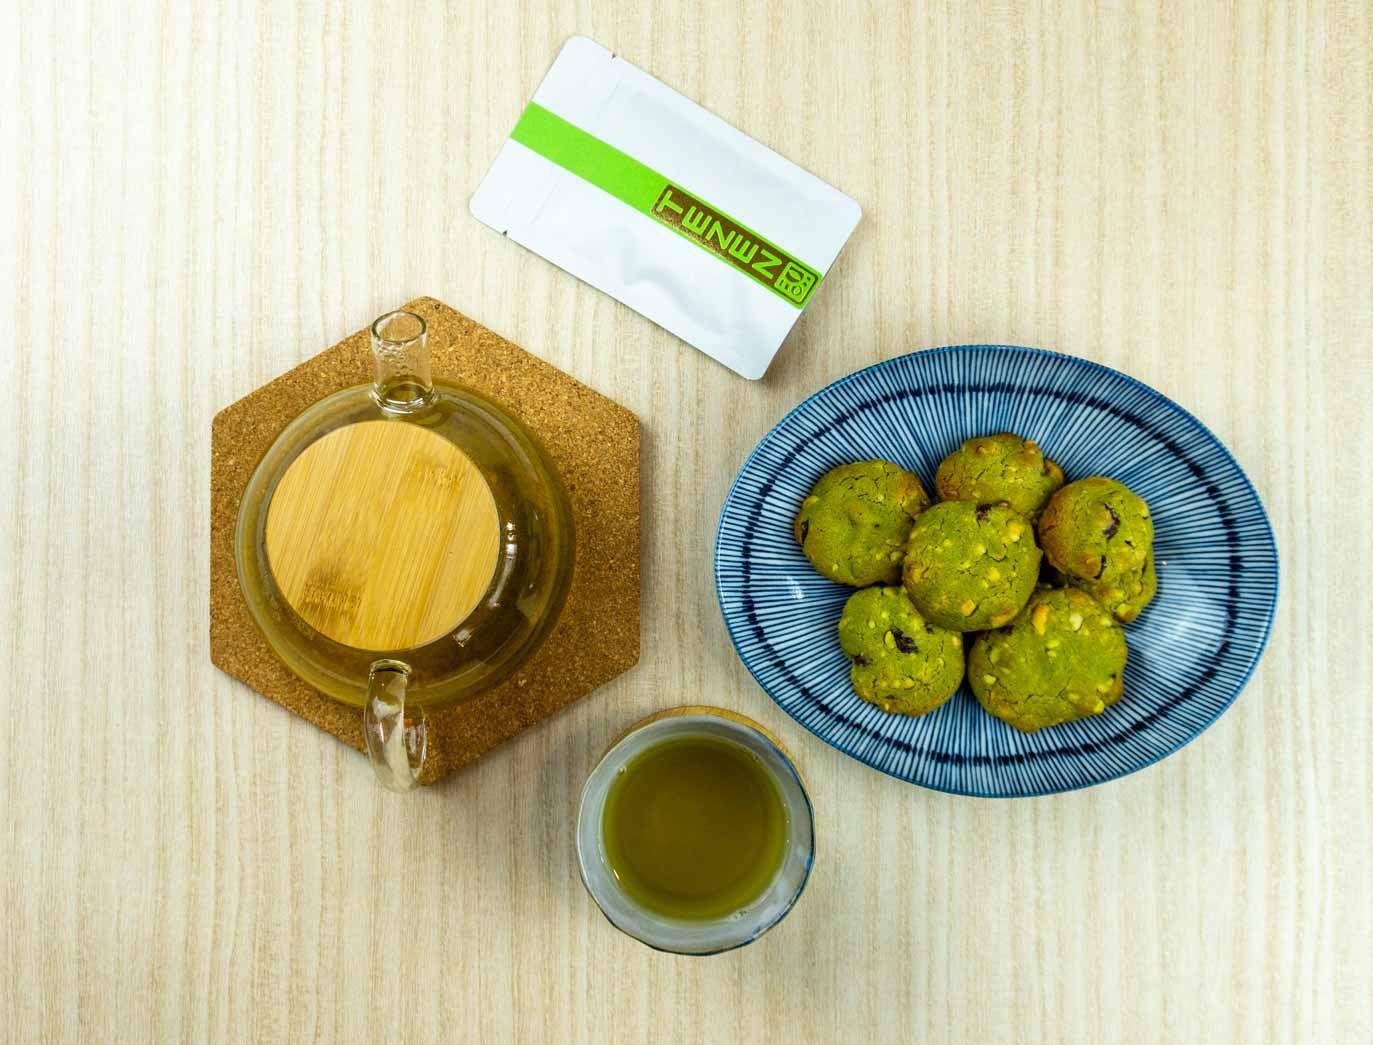 Matcha-Kekse-mit-Bancha-Tee-1 Trail Mix Cookies mit Matcha